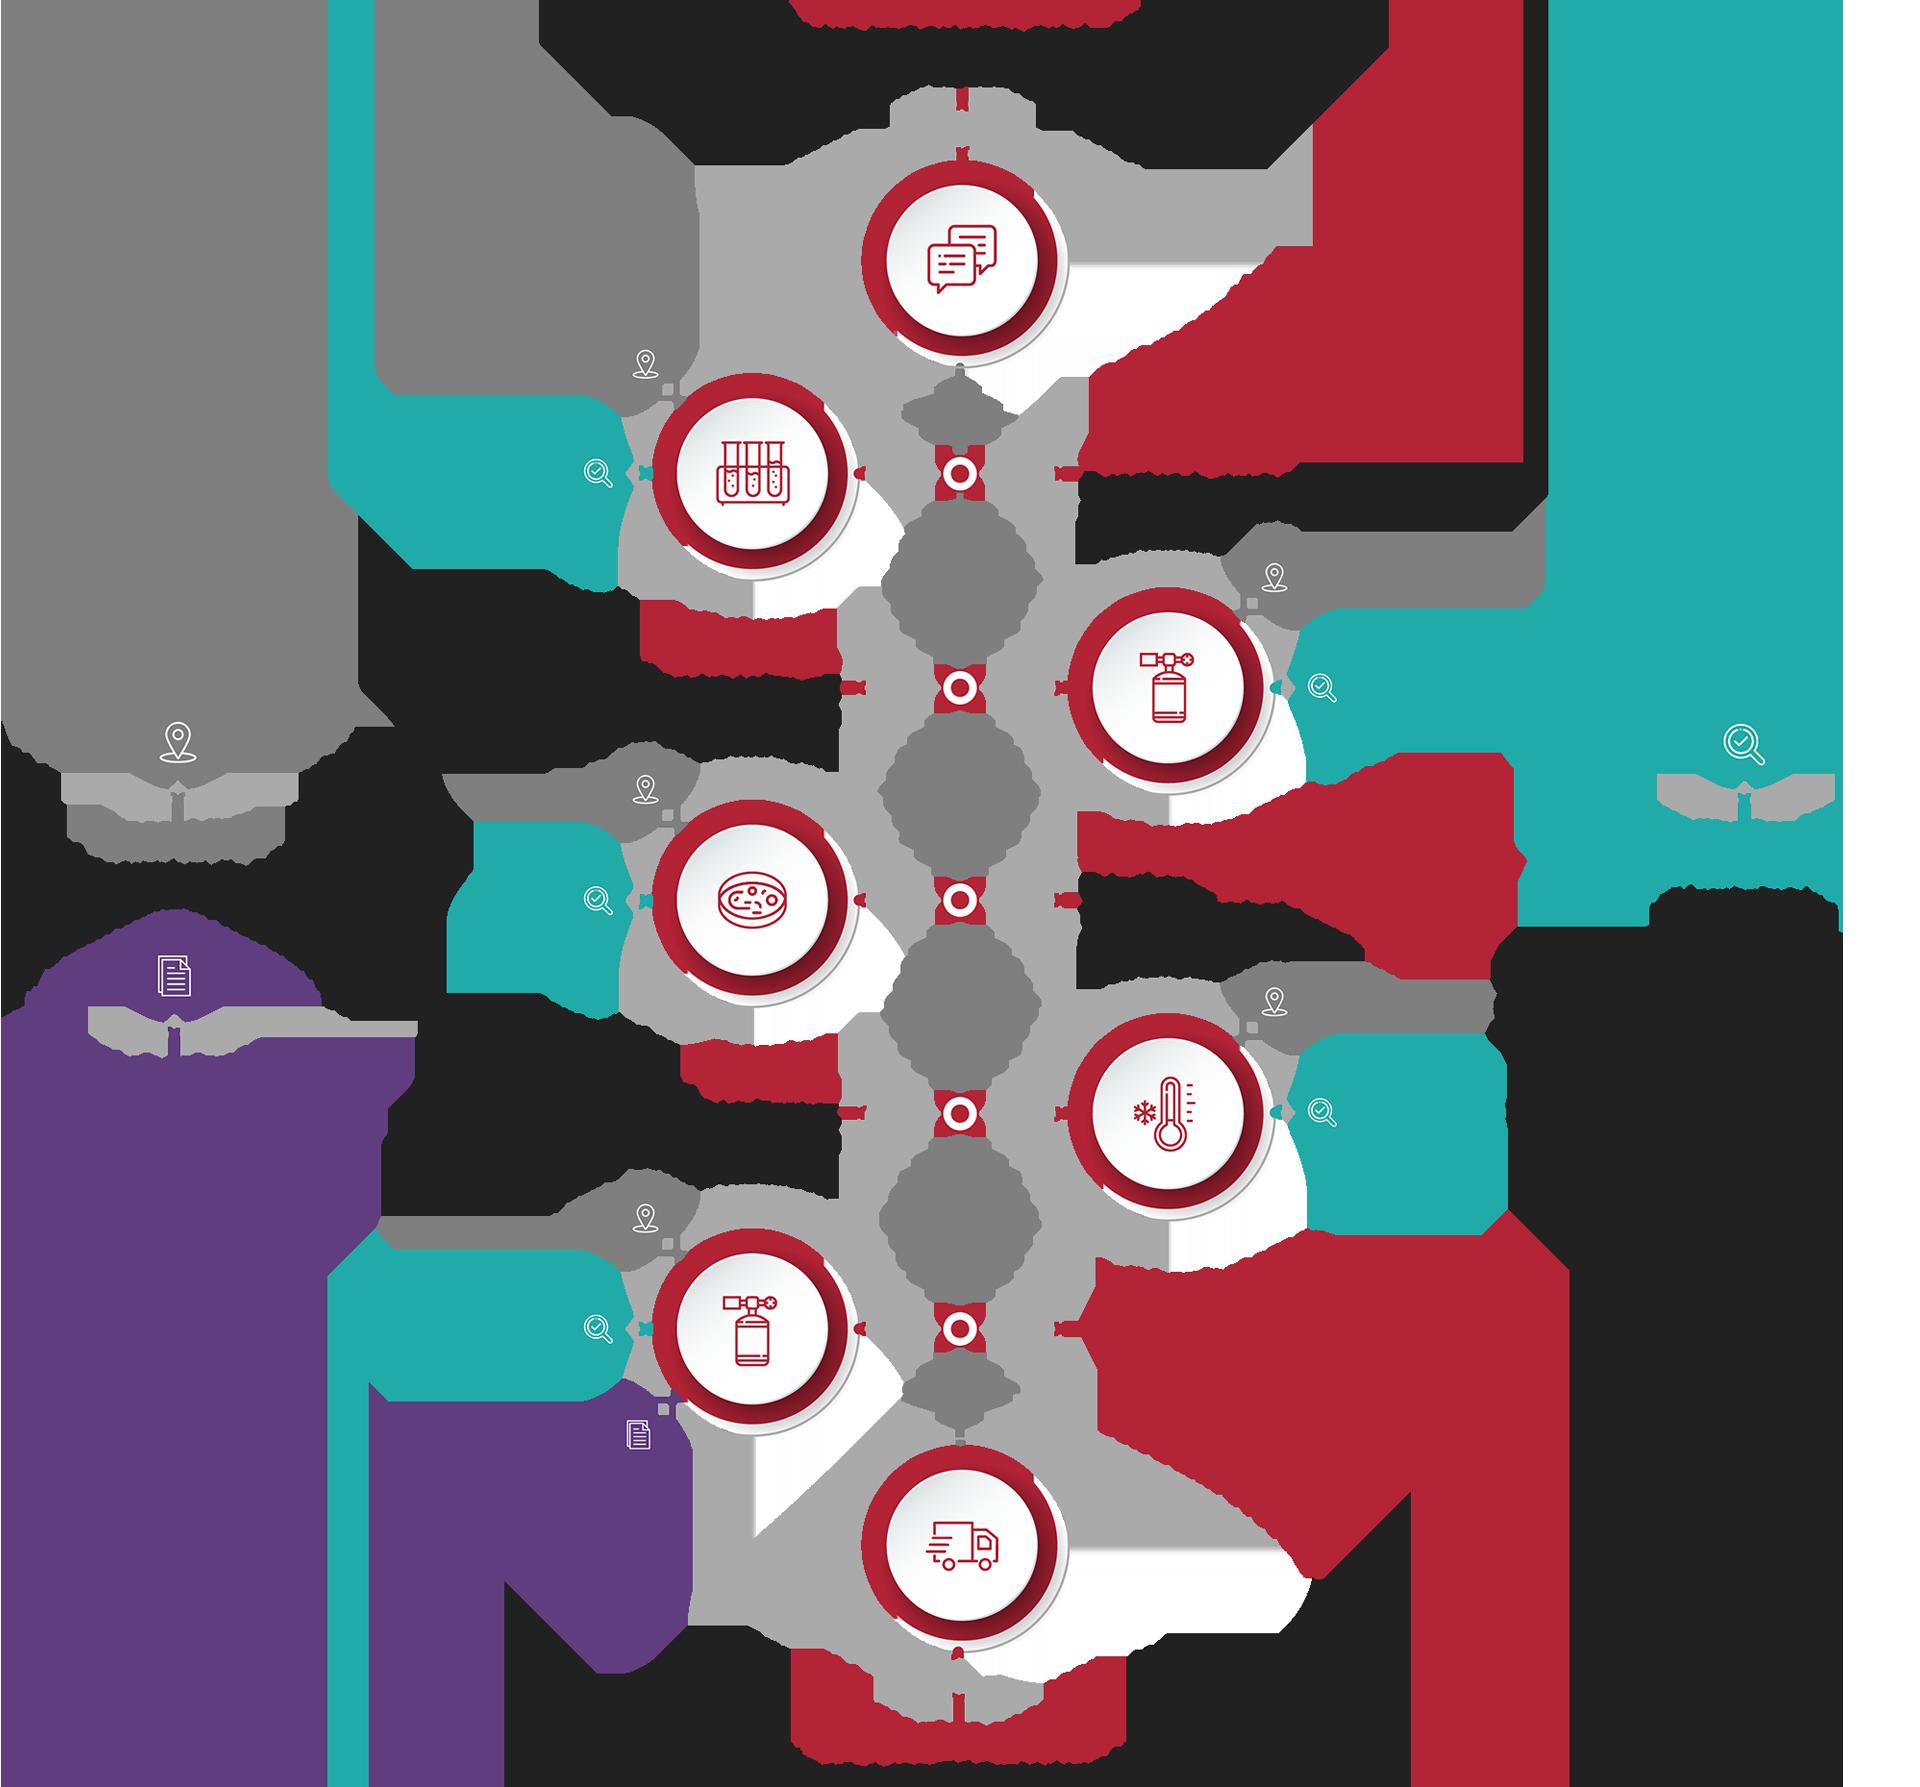 human-cell-design-schema-design-process-web